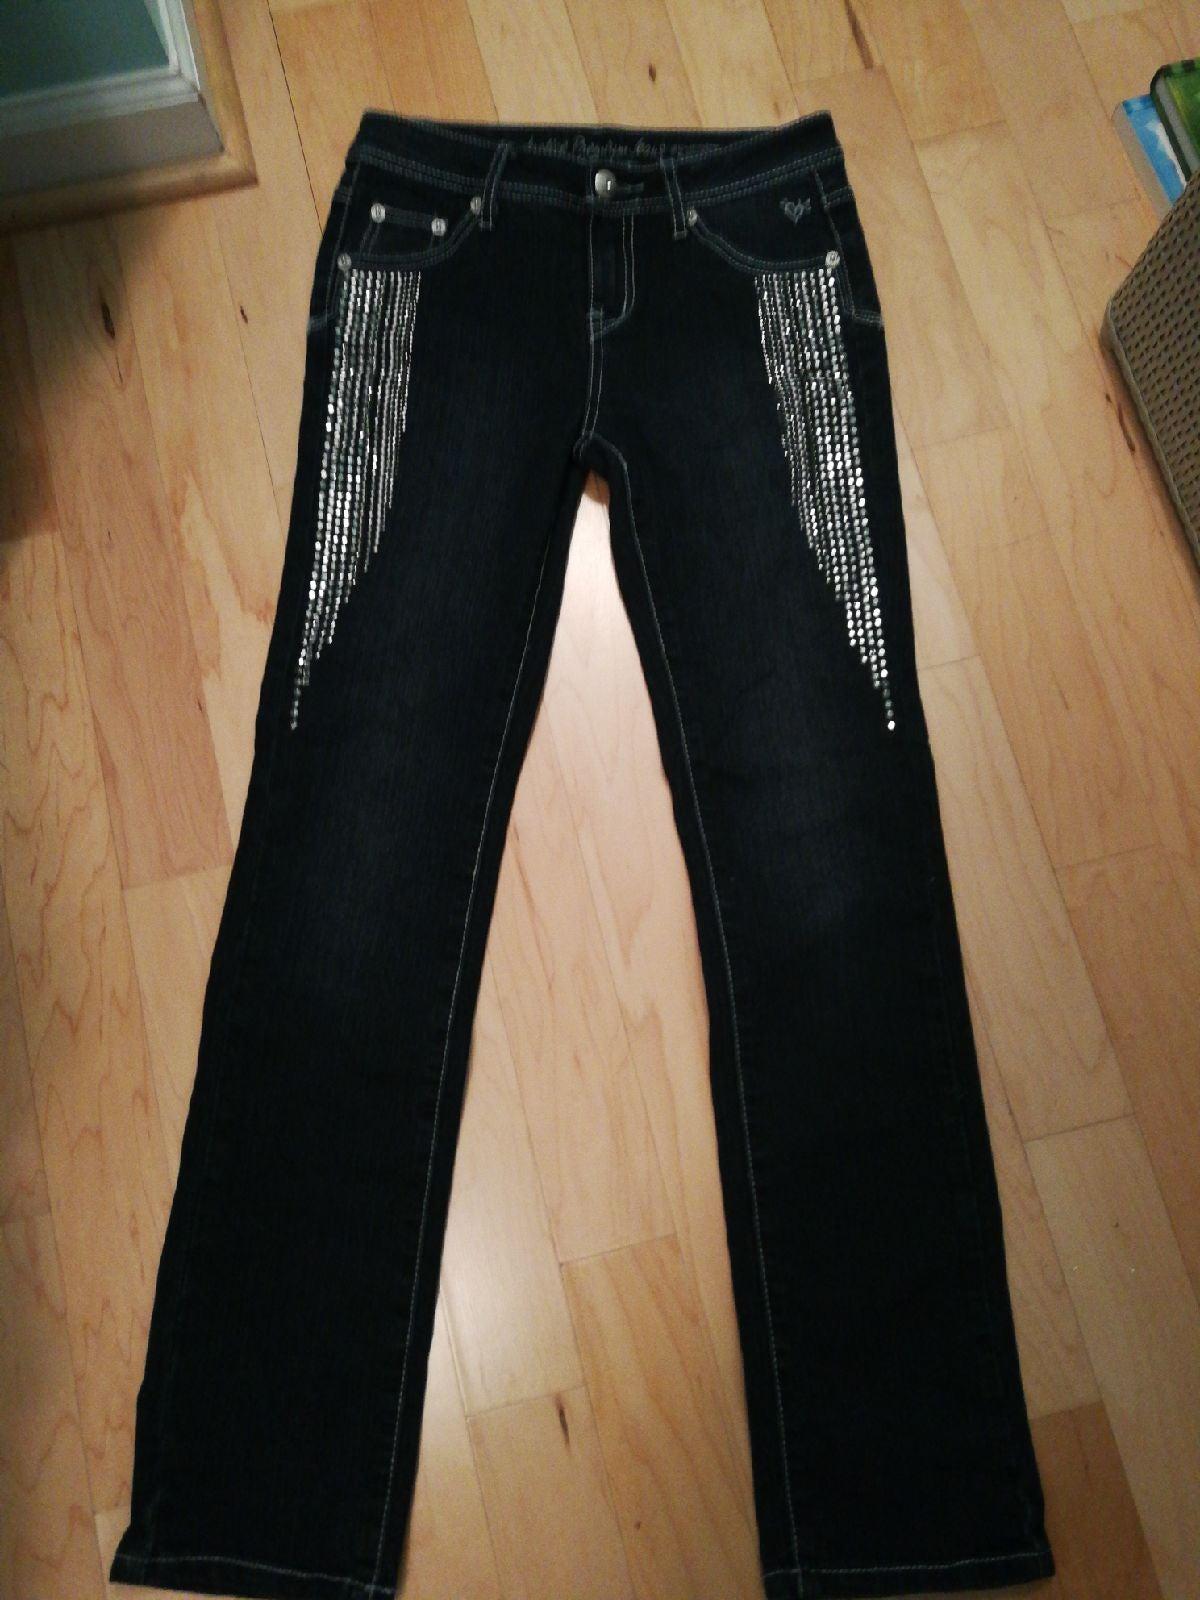 Justice girls jeans sz 12 Regular new